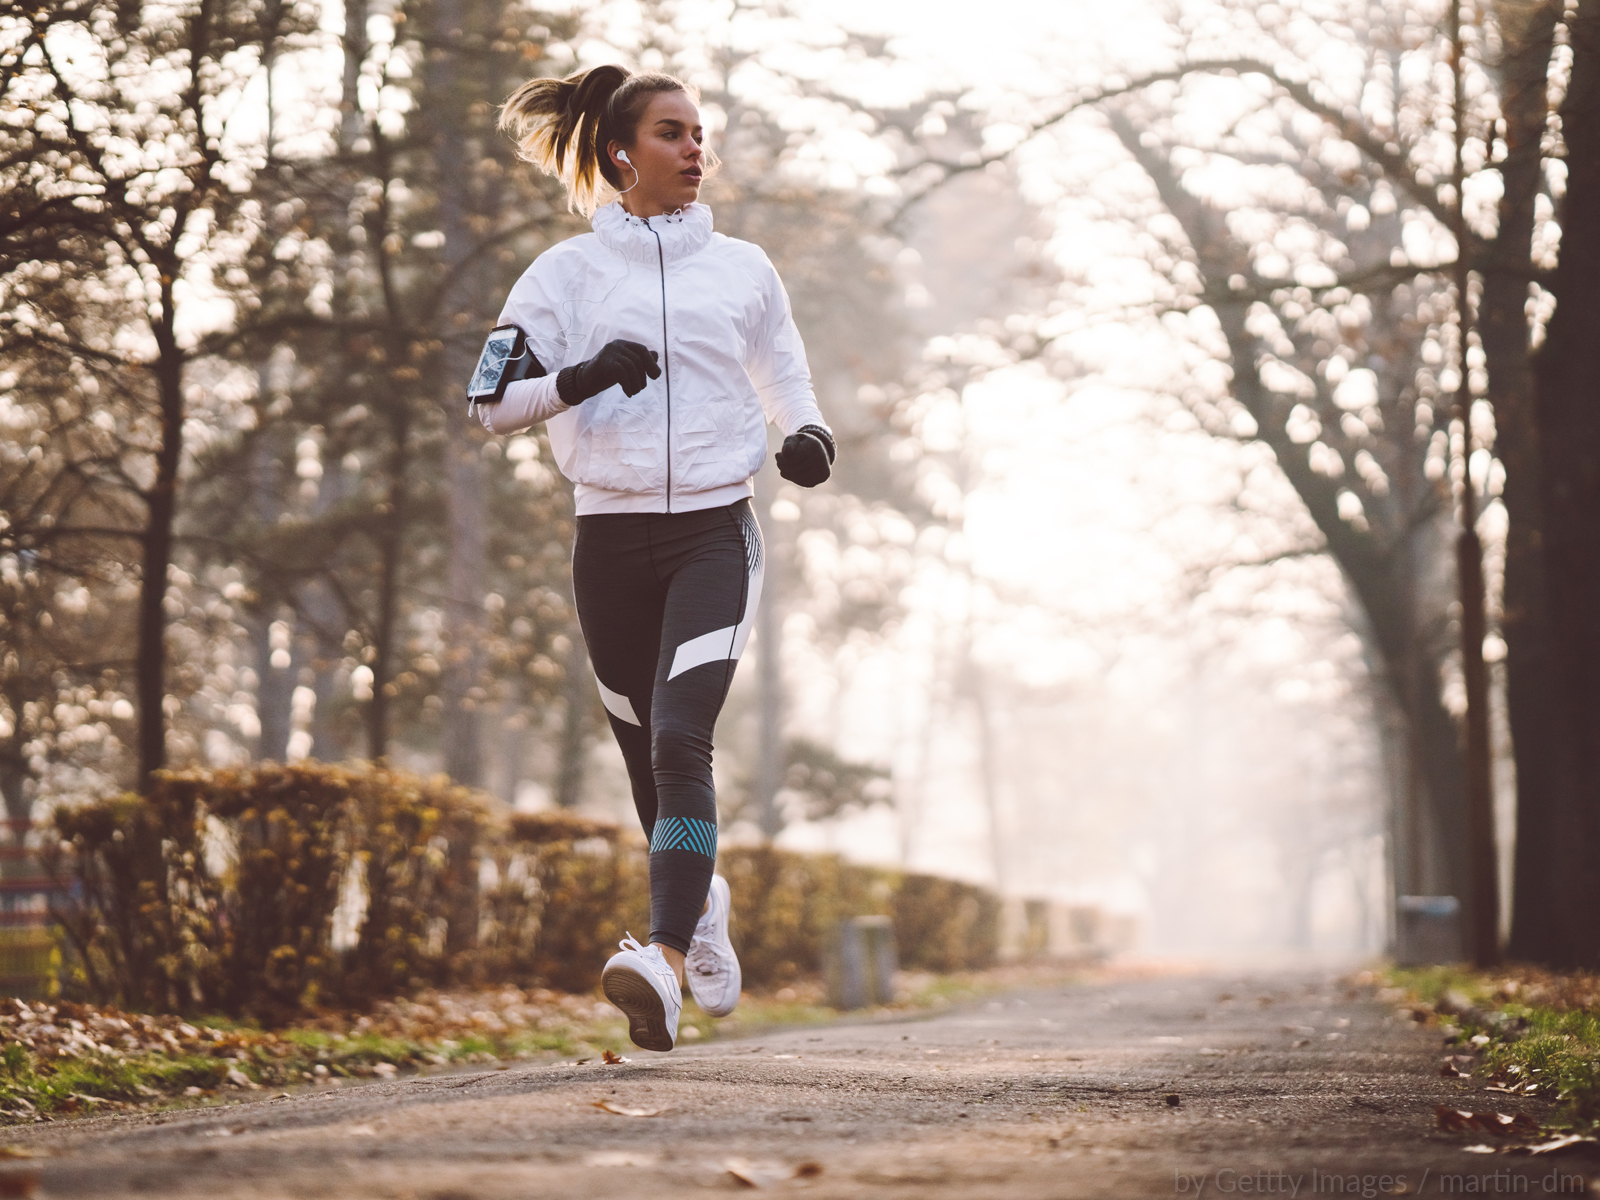 importância dos exercícios físicos no inverno